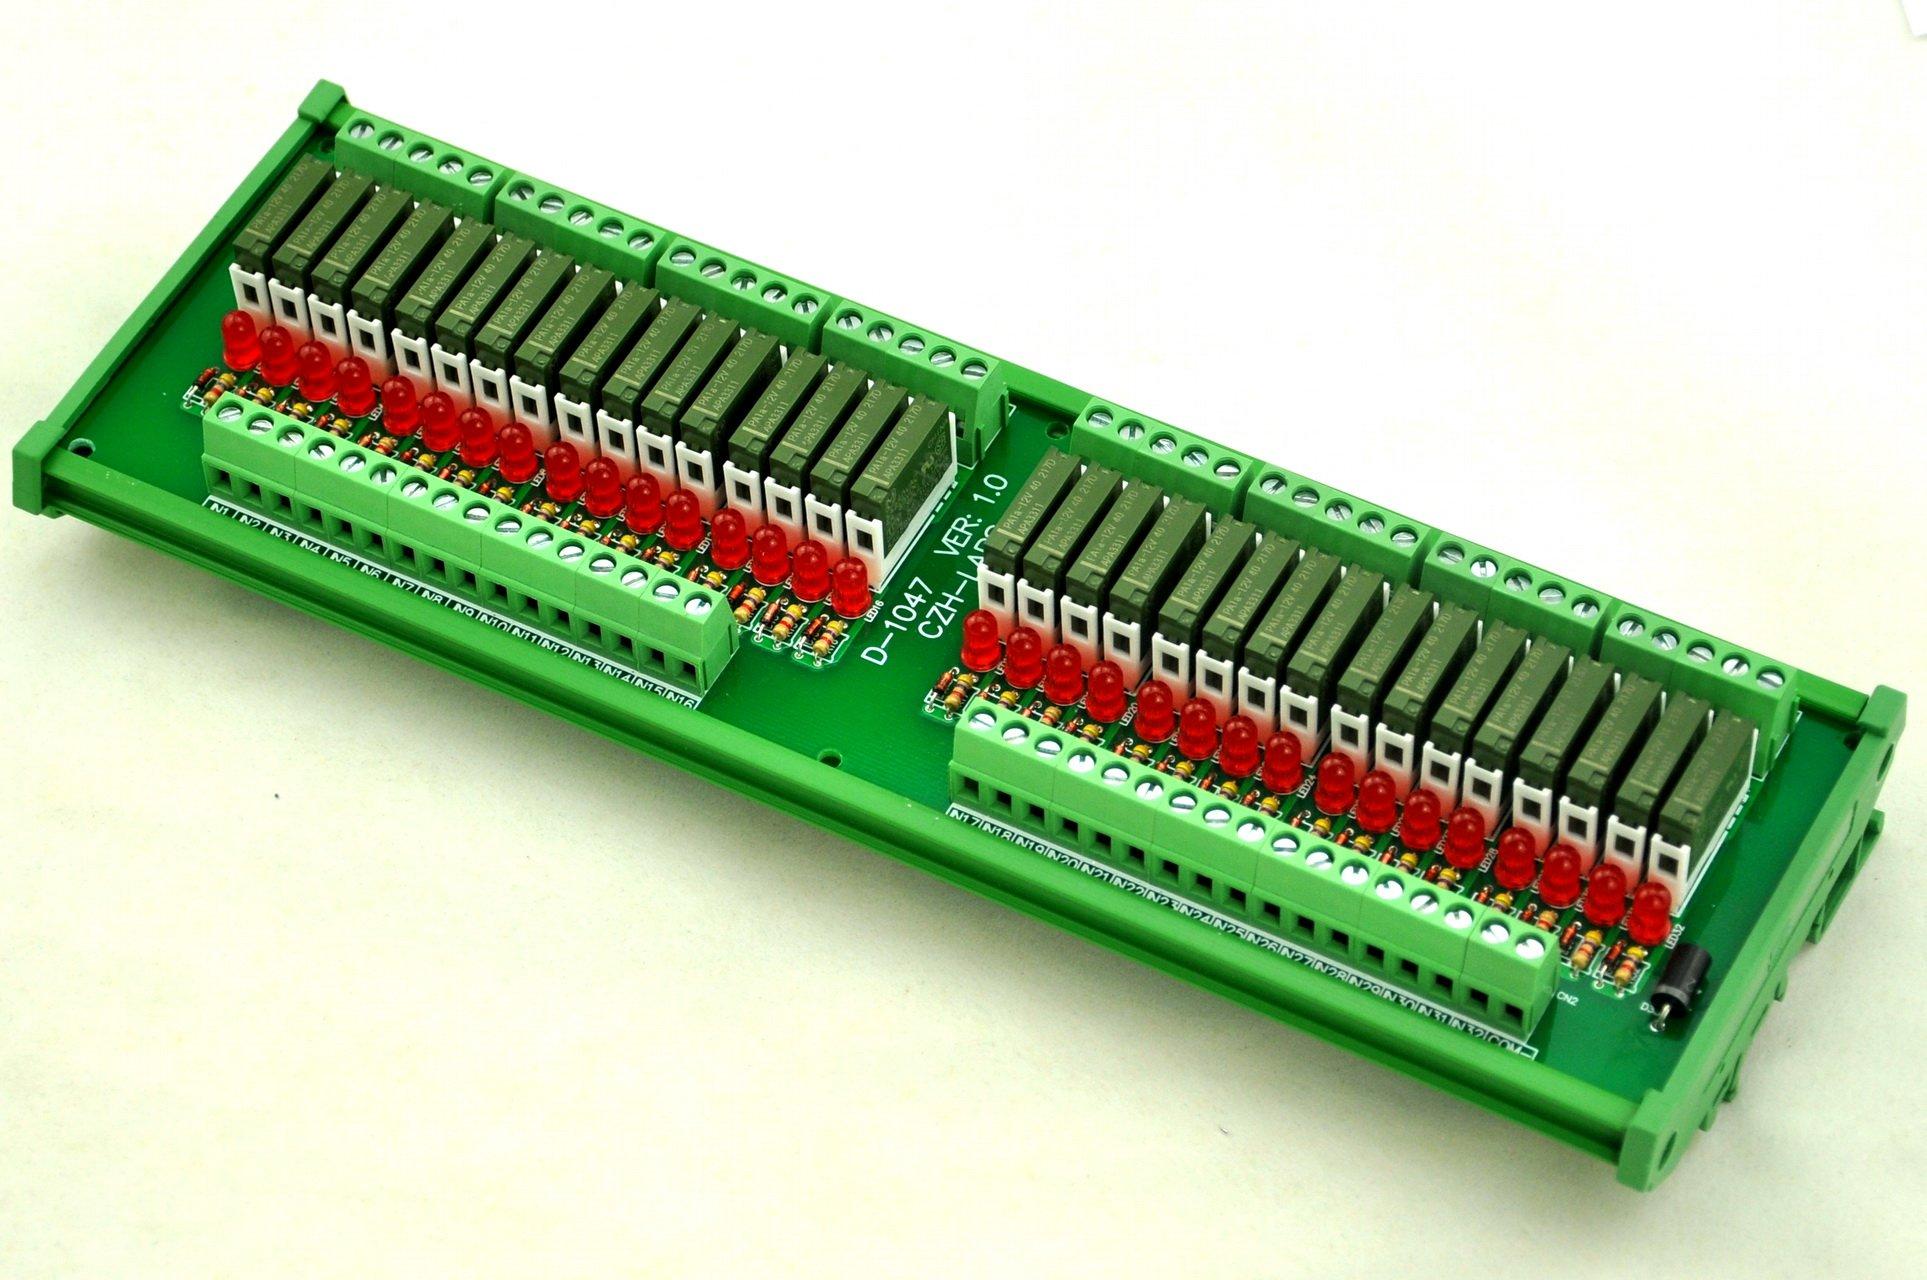 ELECTRONICS-SALON Slim DIN Rail Mount DC12V Source/PNP 32 SPST-NO 5A Power Relay Module, PA1a-12V